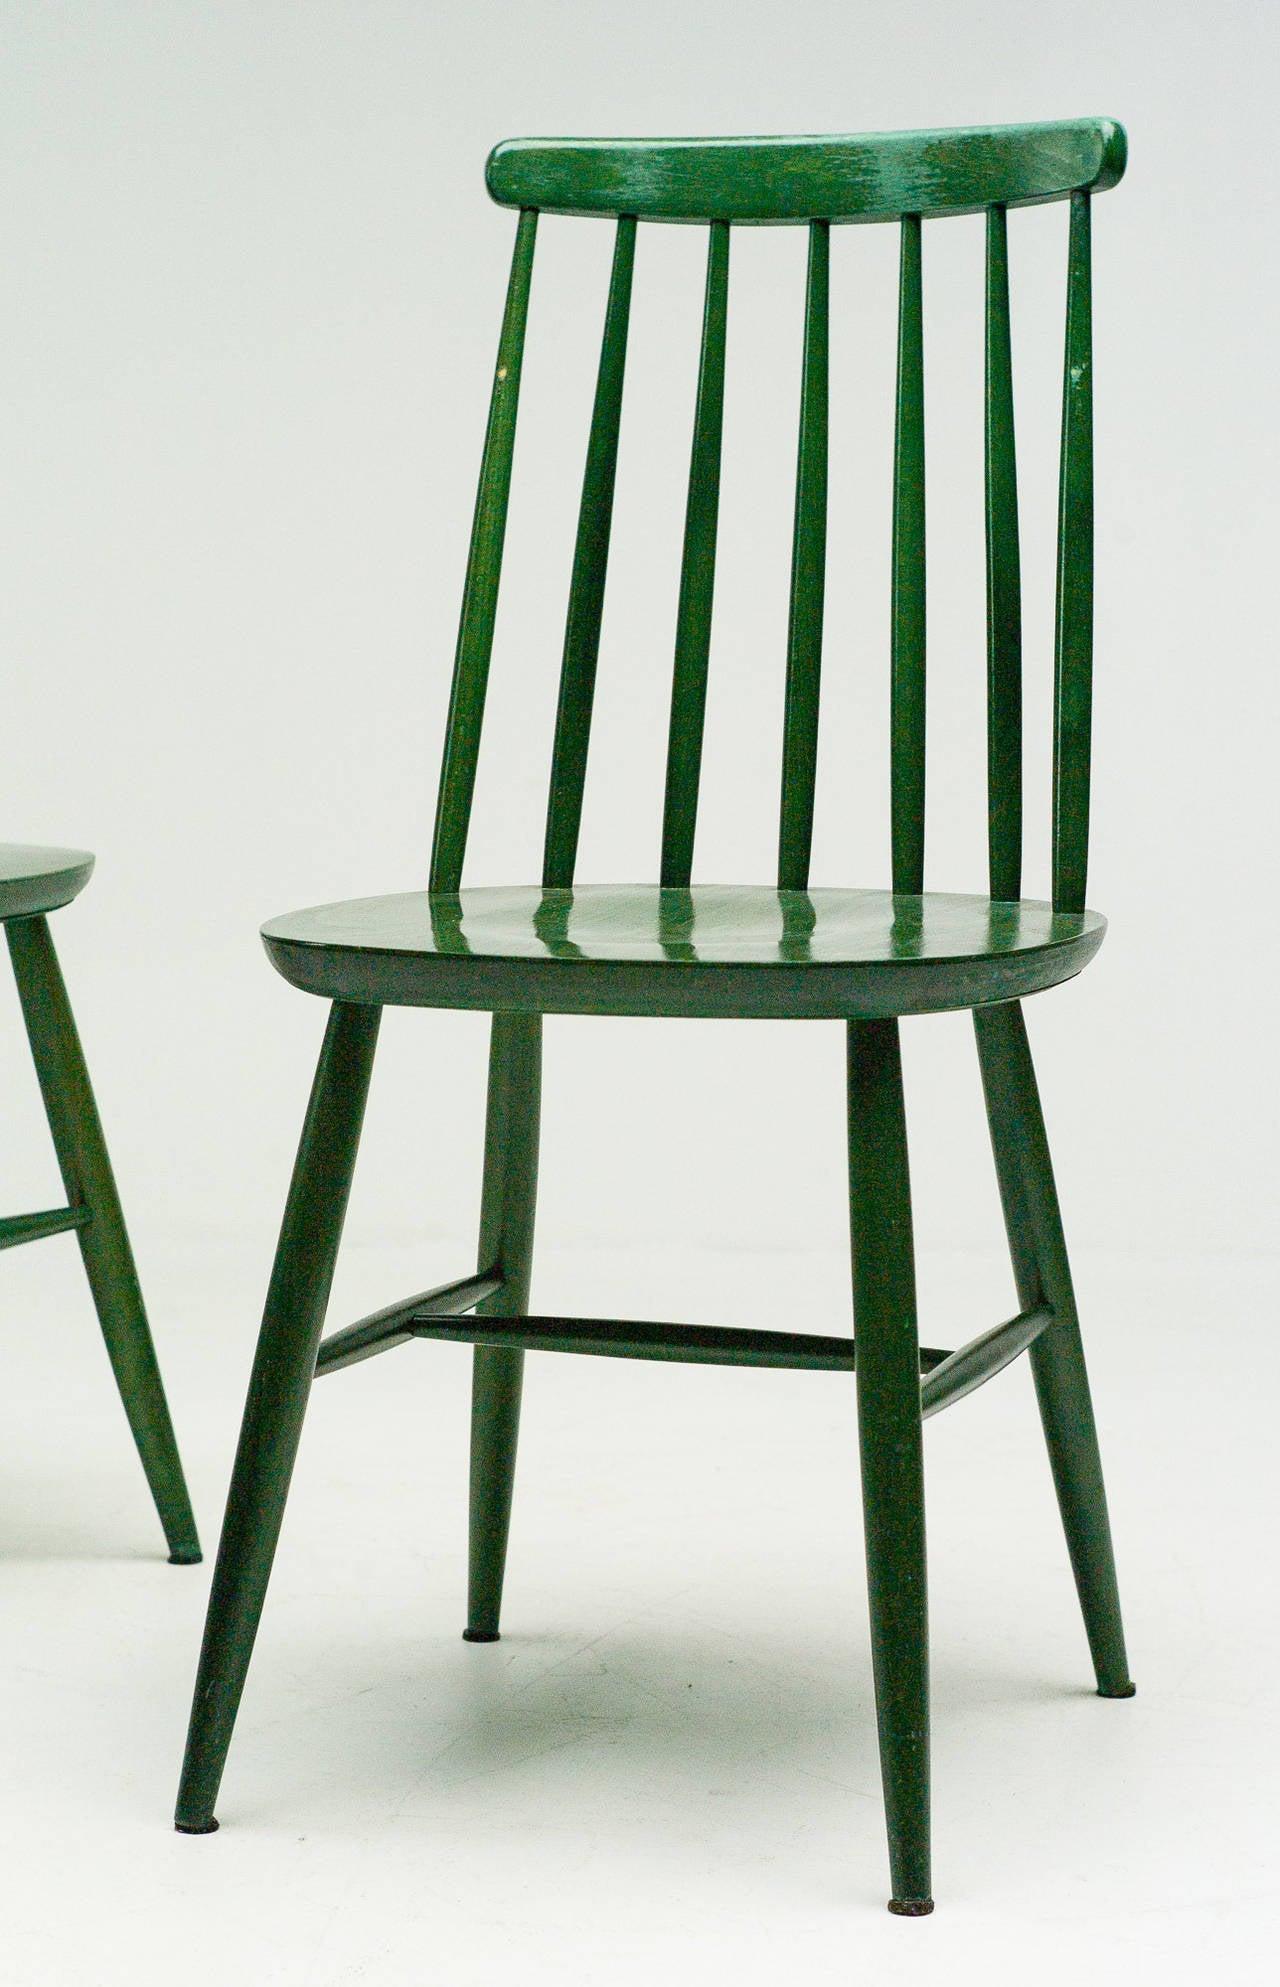 Pair of Green Tapiovaara Chairs For Sale at 1stdibs